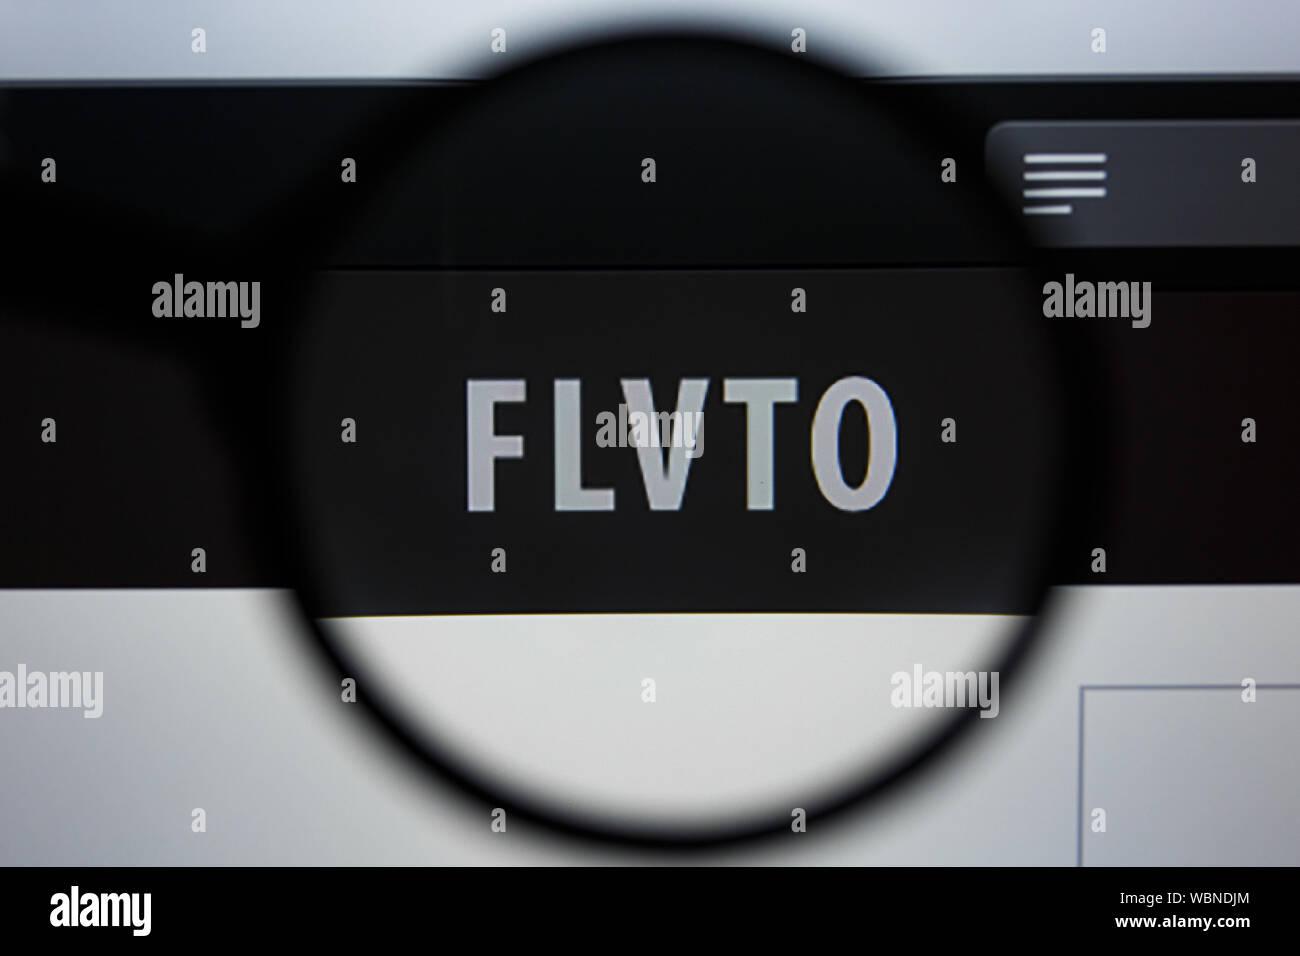 Flvto Telecharger Flvto Revue Converterix Youtube Mp3 Converter